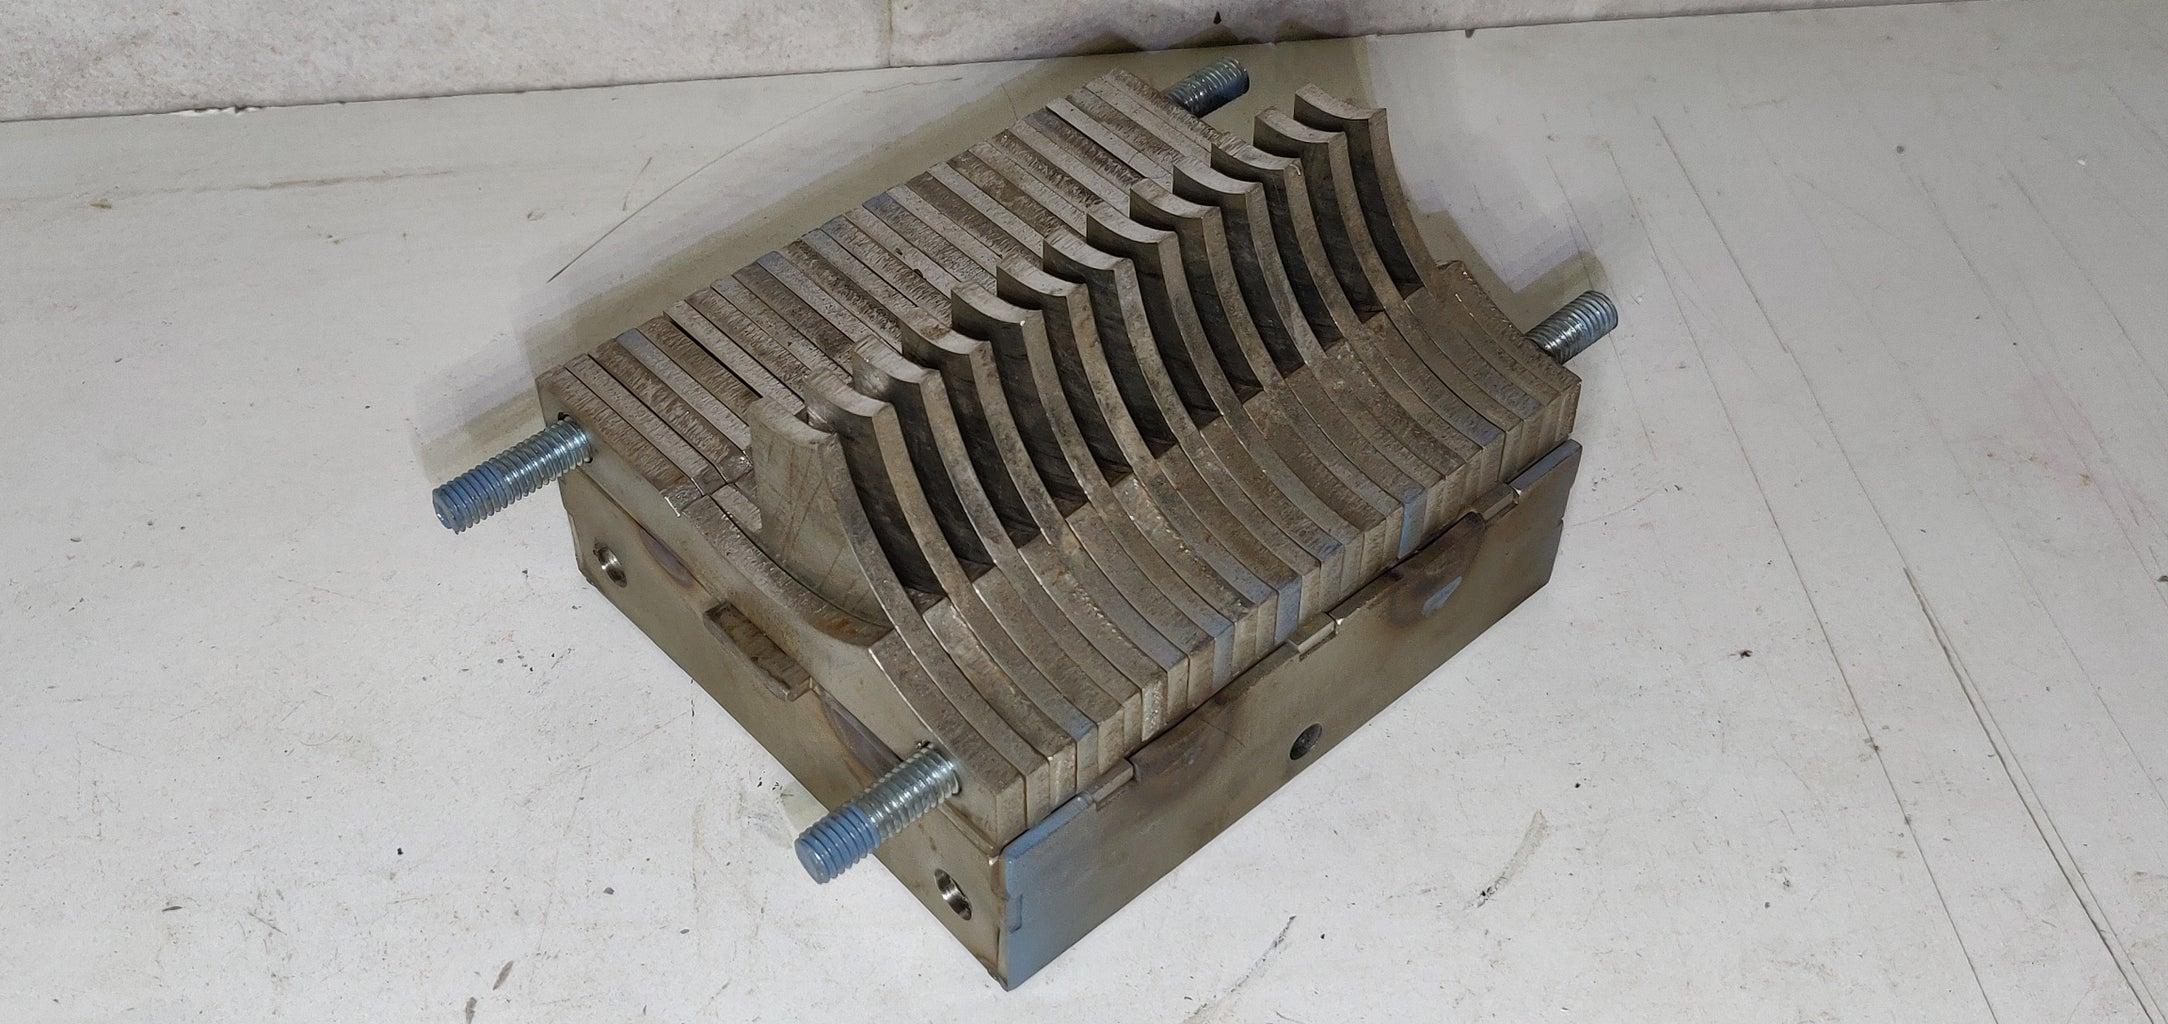 Axle for the Shredder